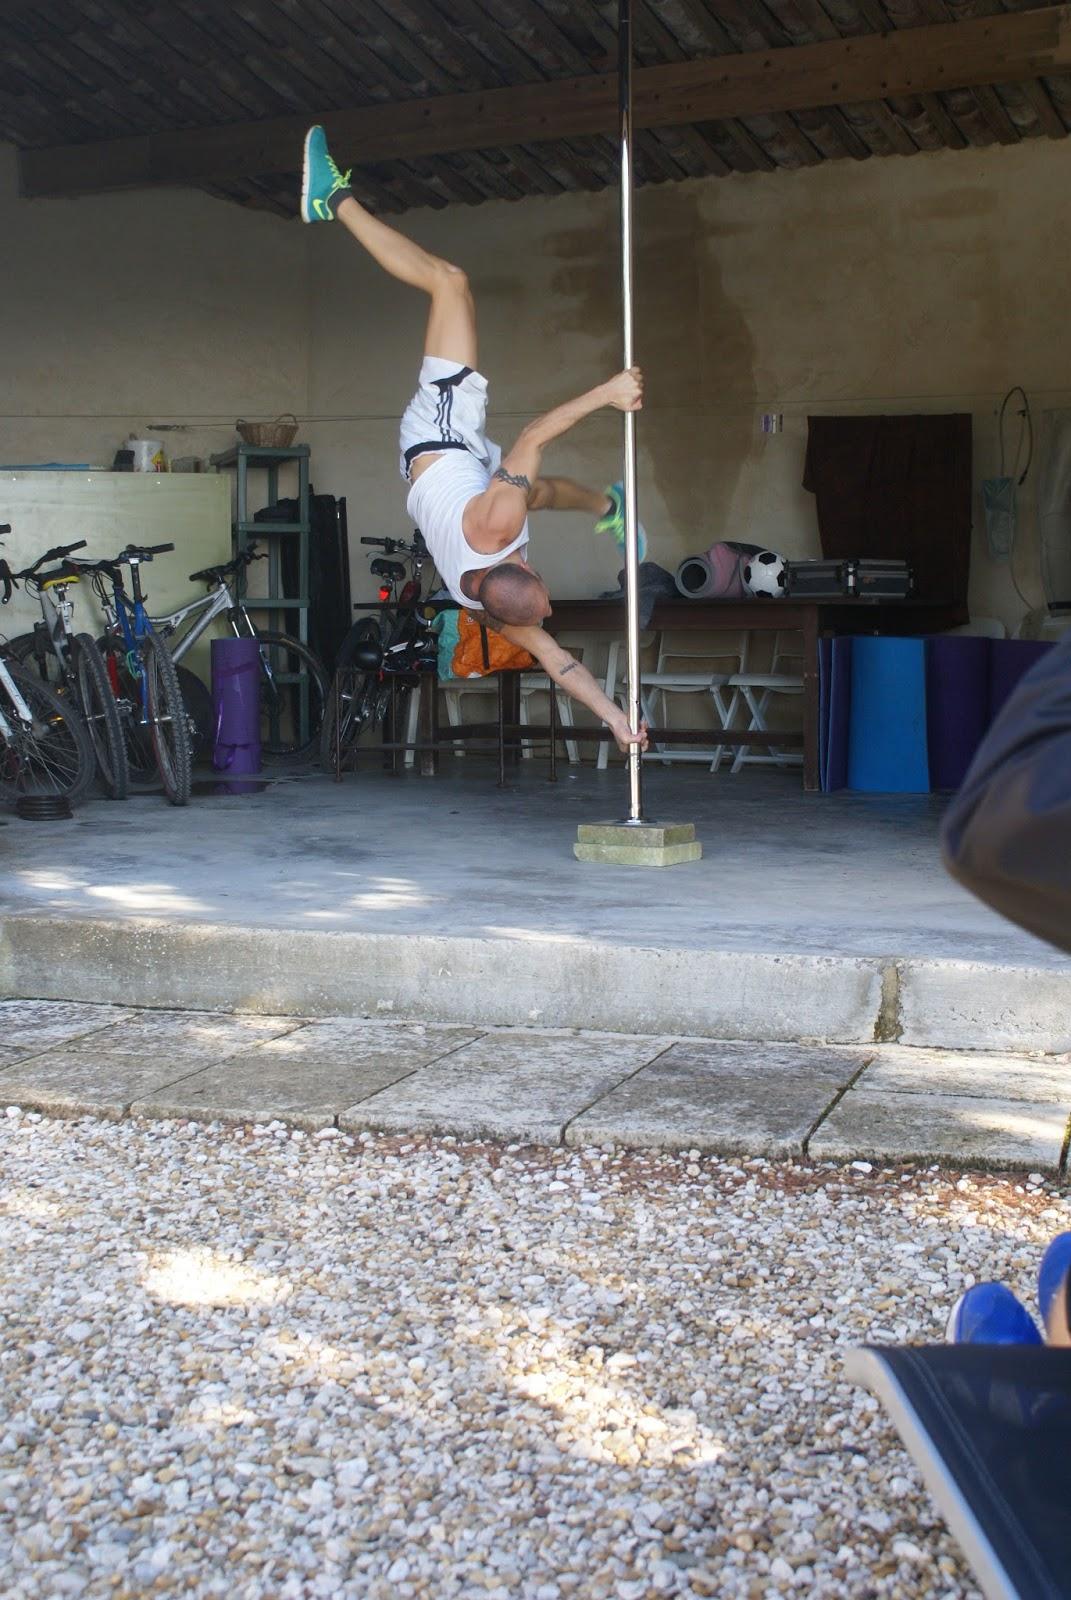 Gr gory capra pole dance en luberon for Barre de danse occasion